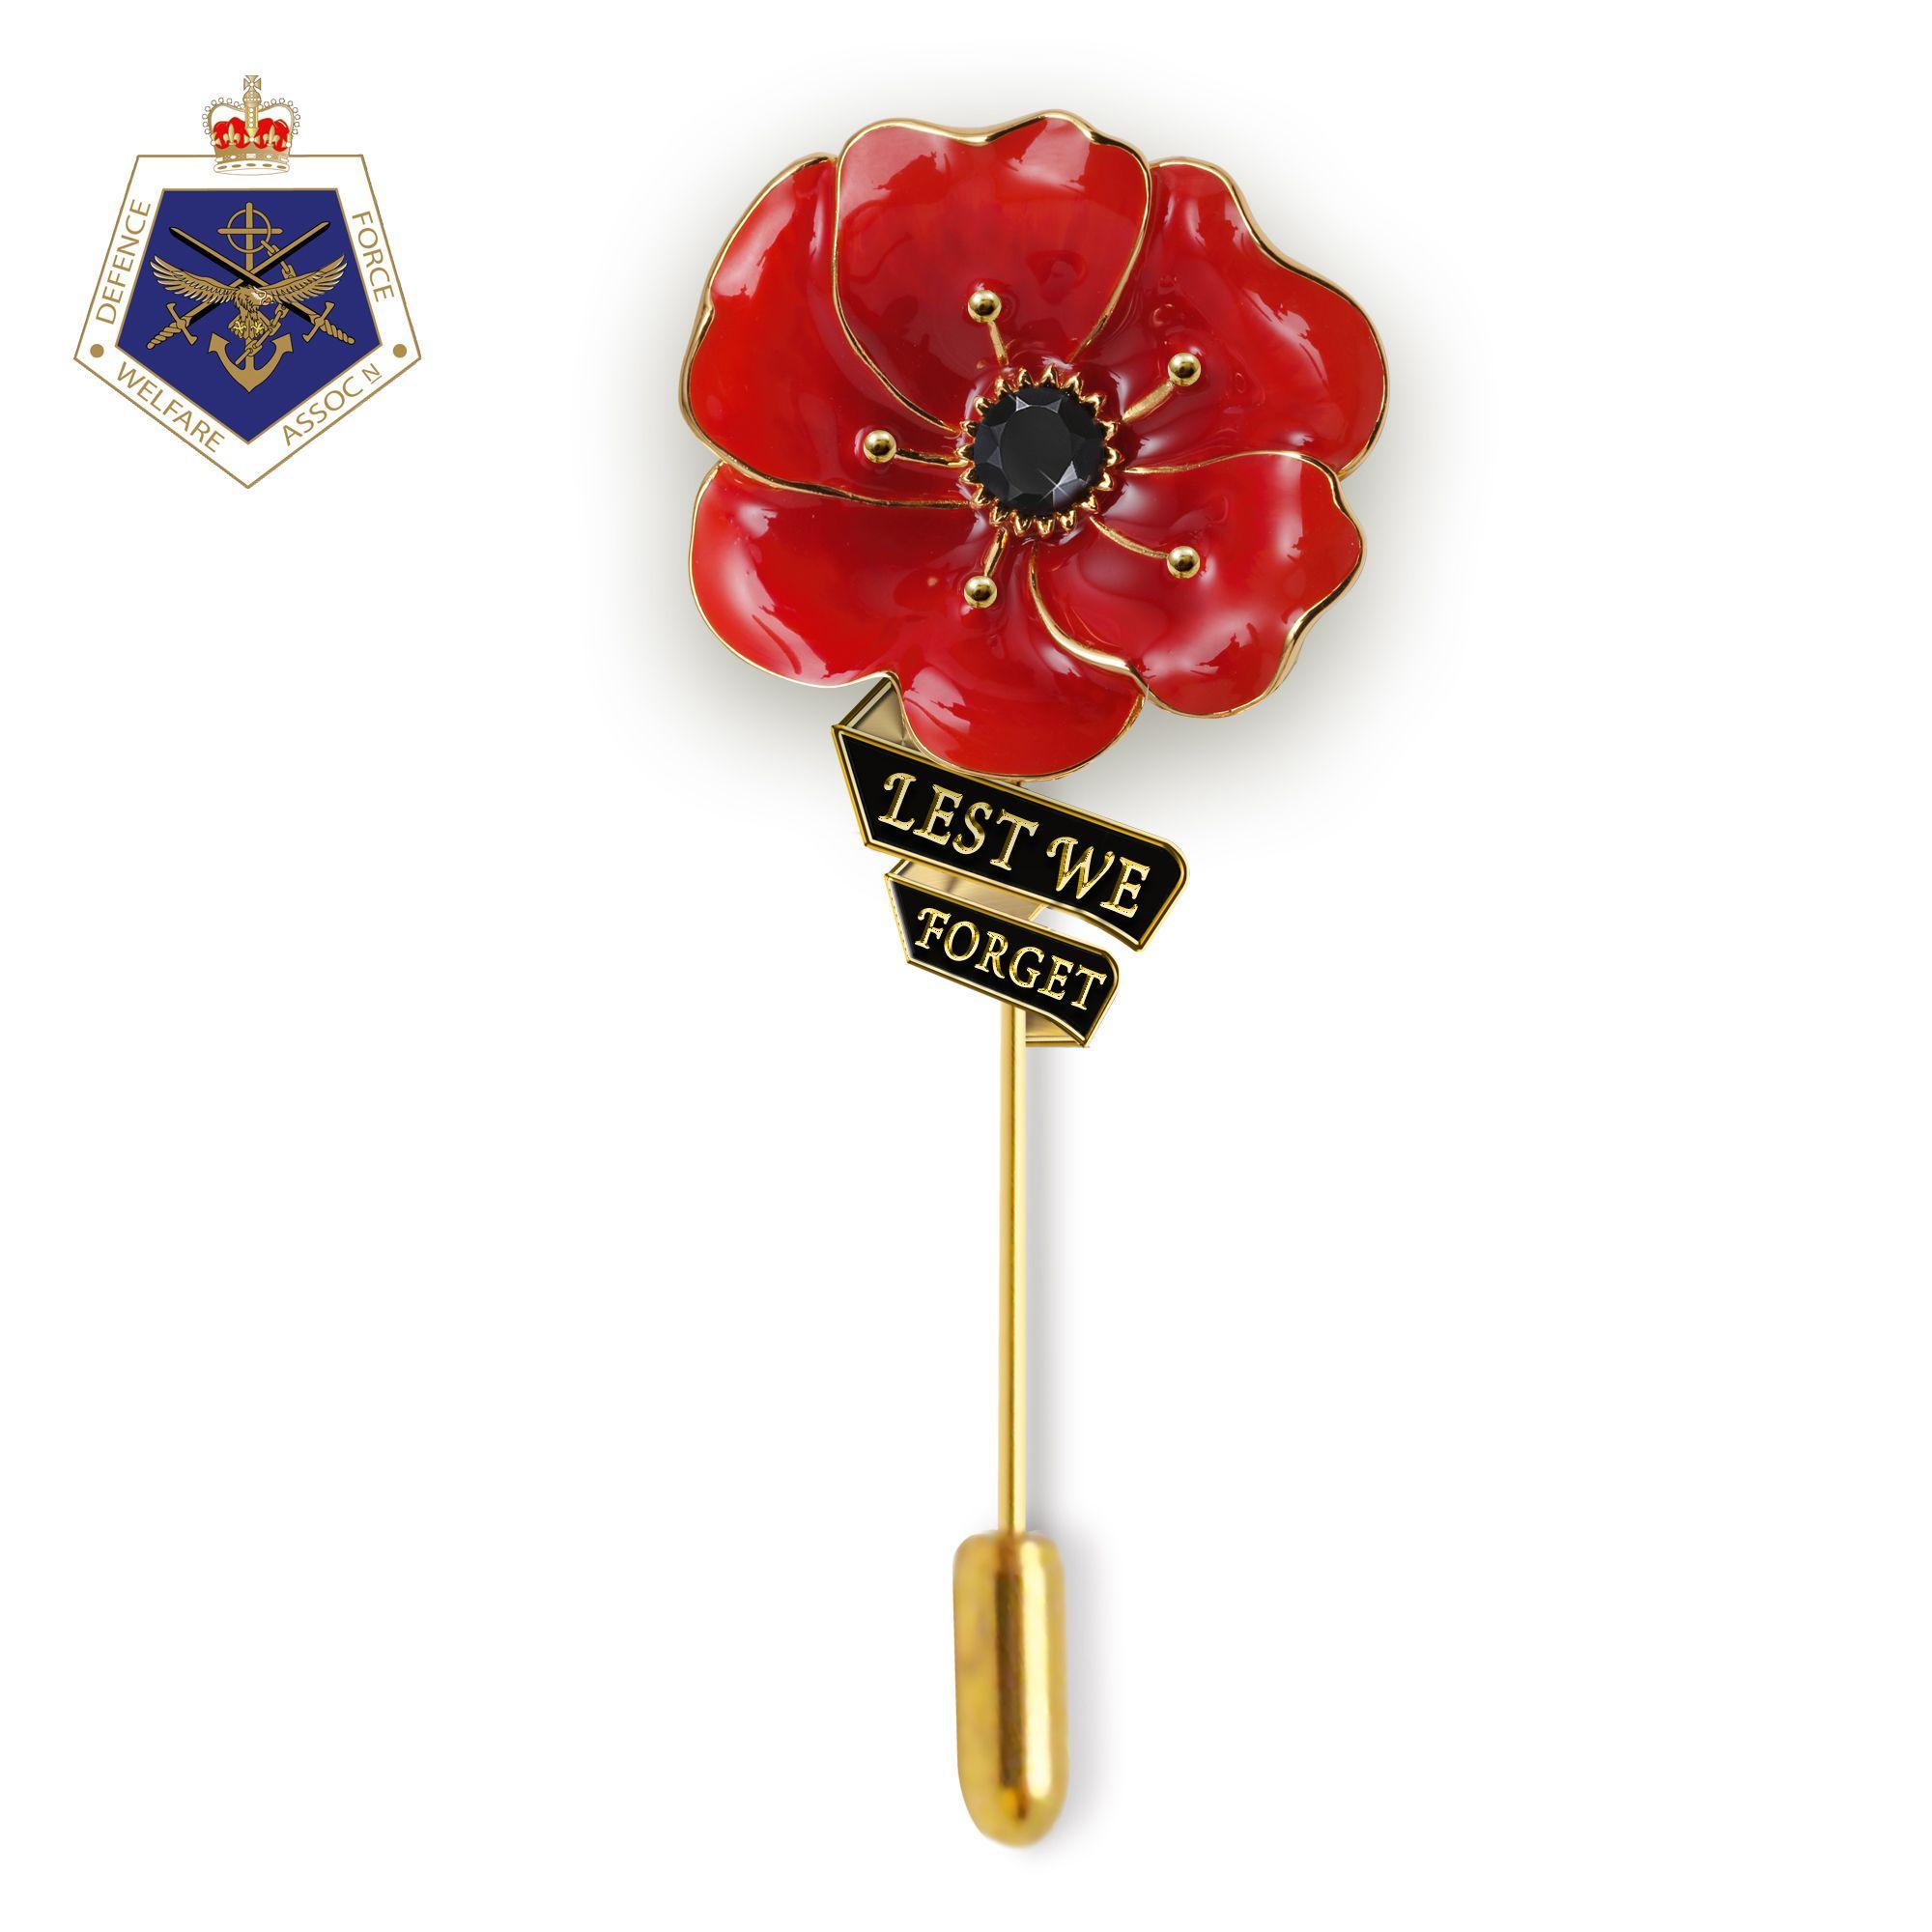 Details about Flanders Fields Men's Poppy Lapel Pin by The Bradford Exchange